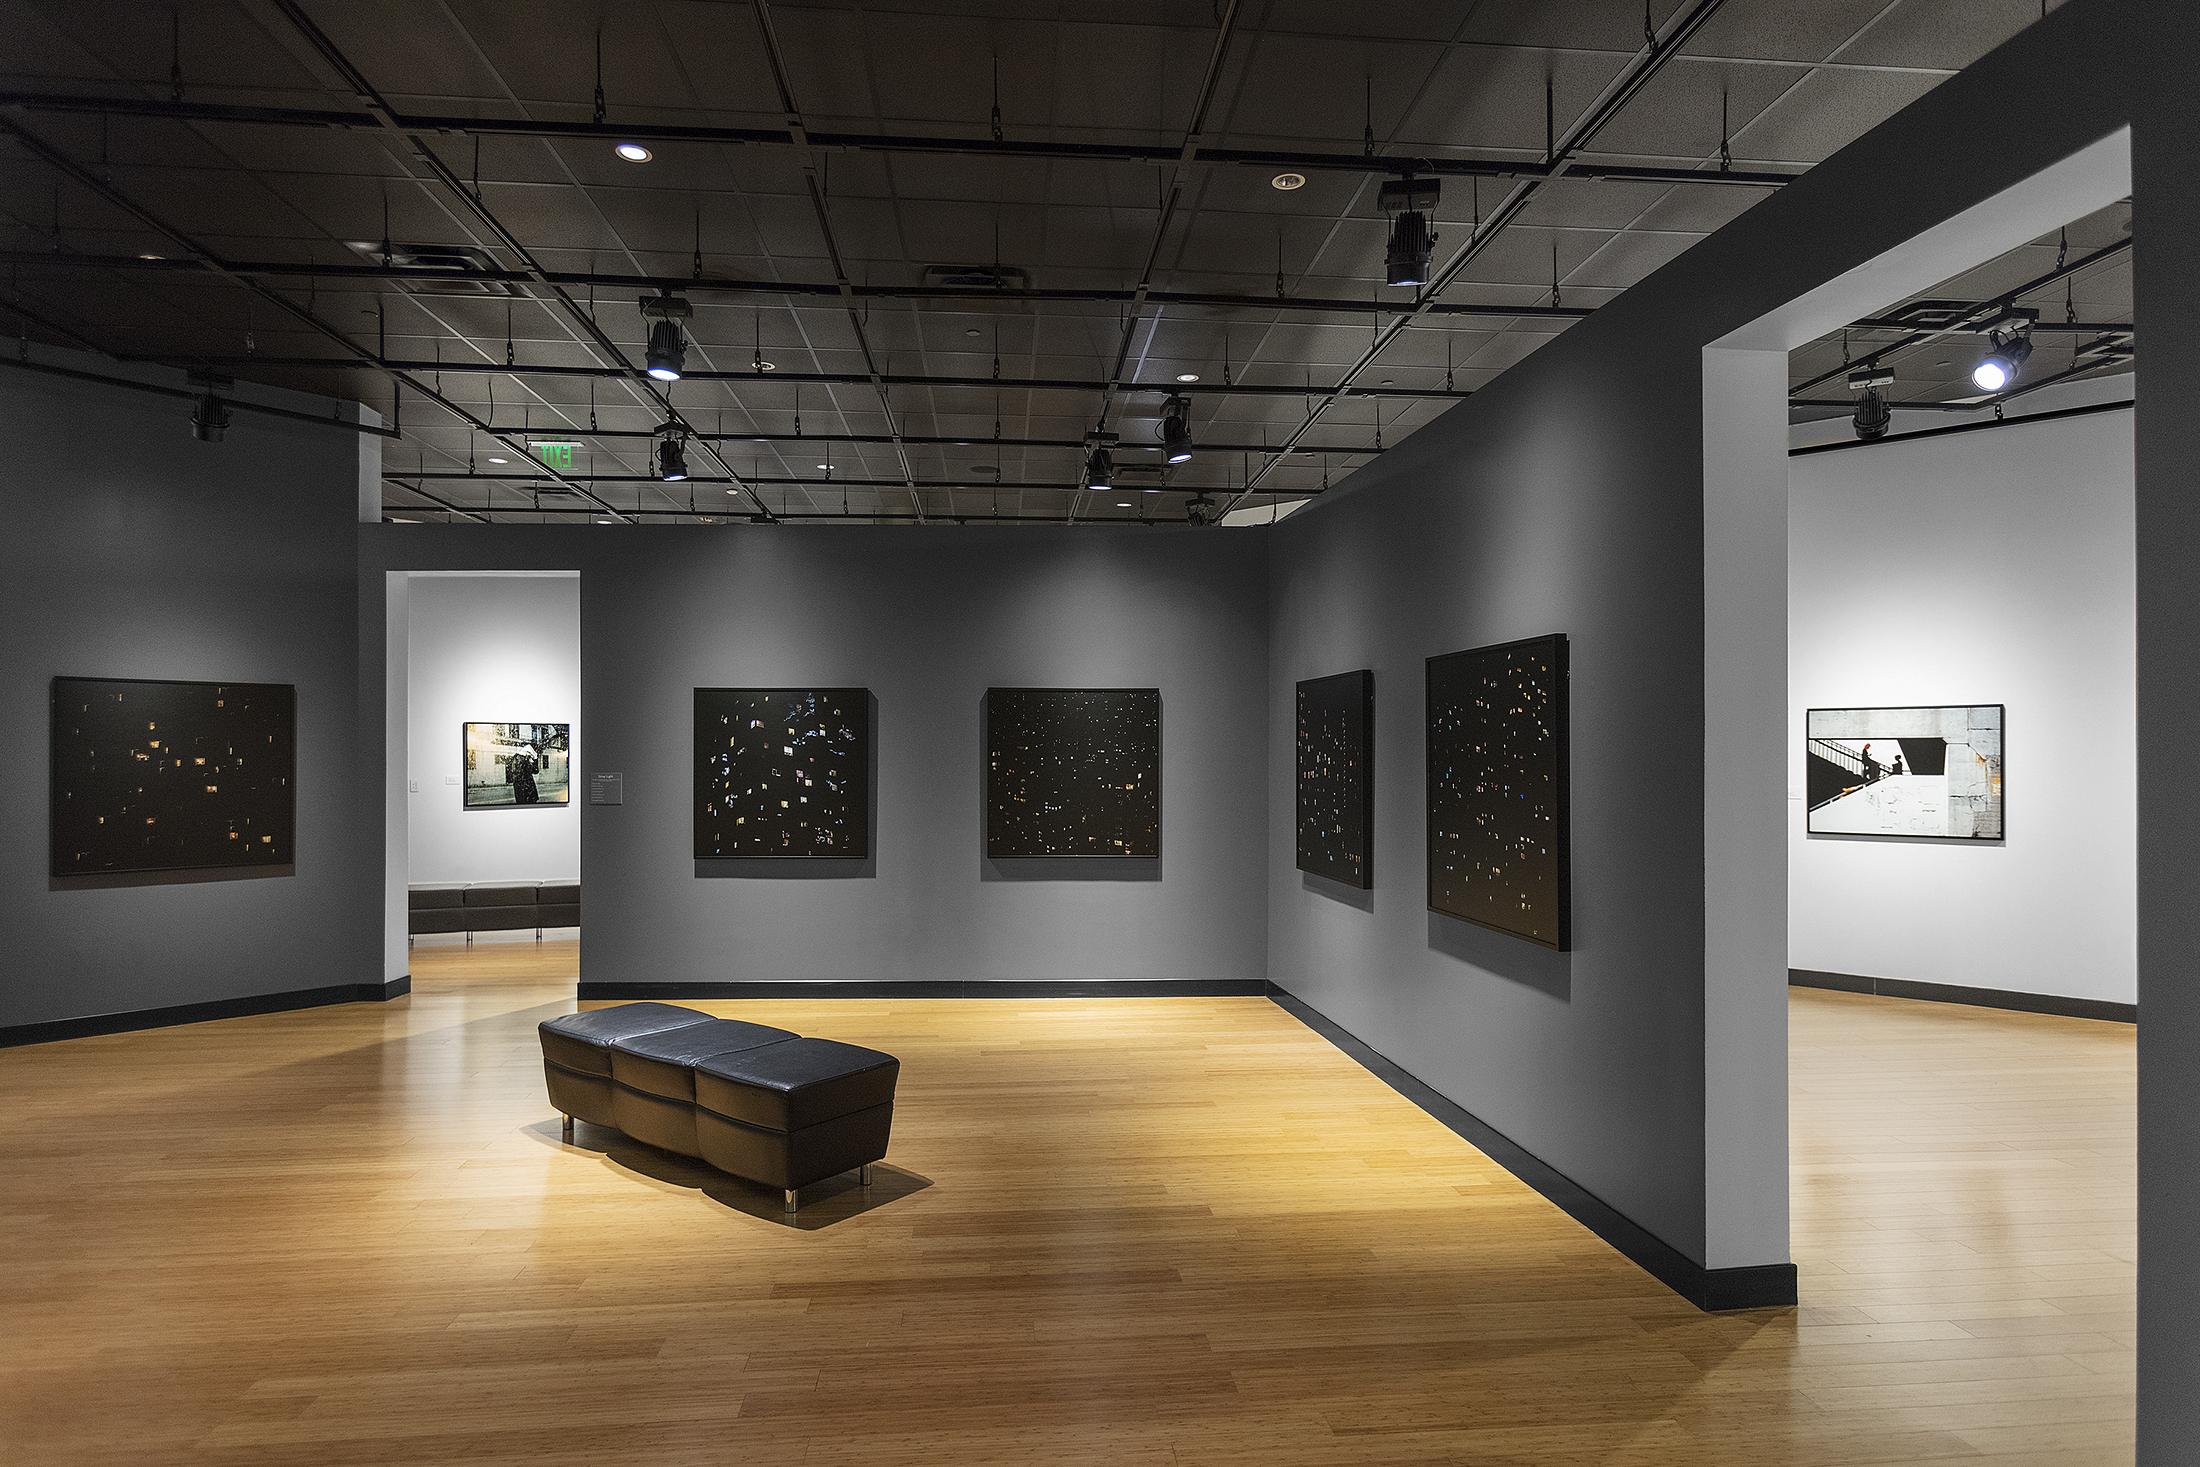 Clarissa Bonet_Urban Constructs_Southeast Museum 2019_07.jpg